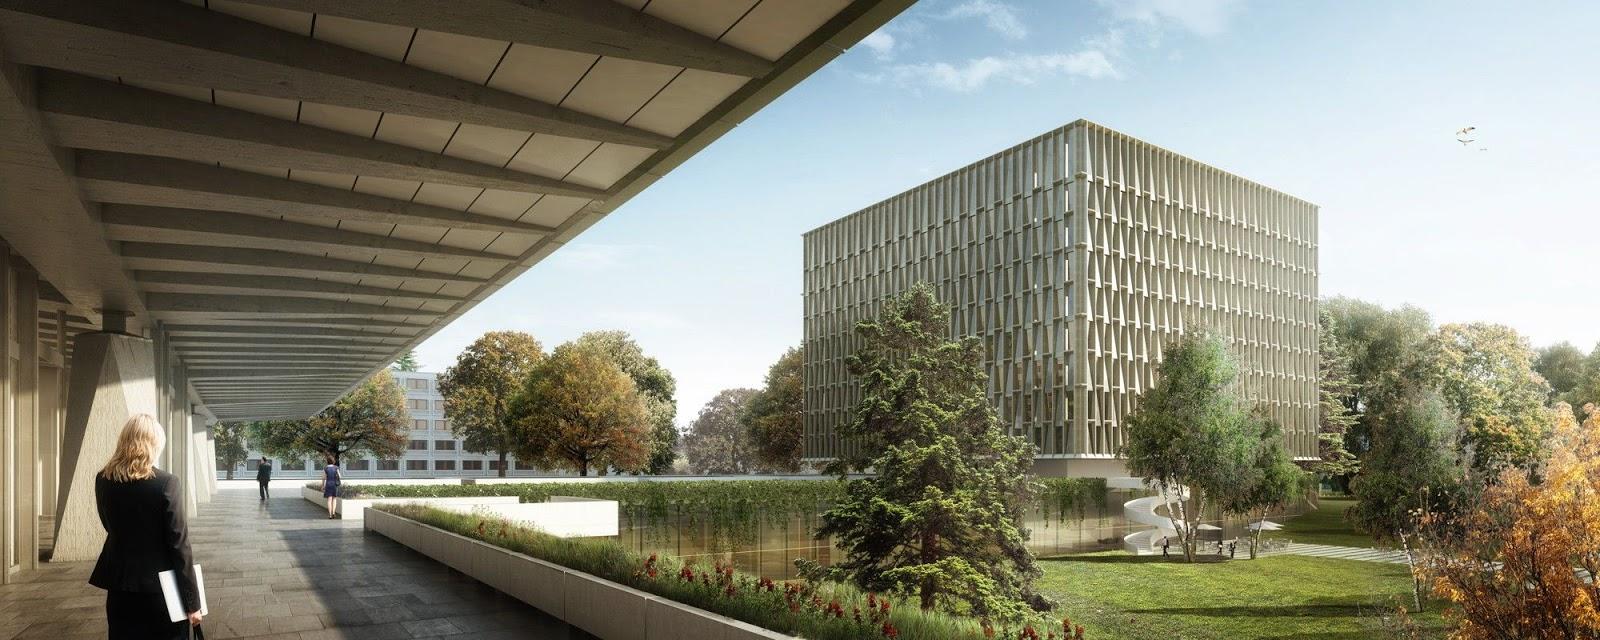 Berrel berrel kr utler architekten a f a s i a for K architecture geneve